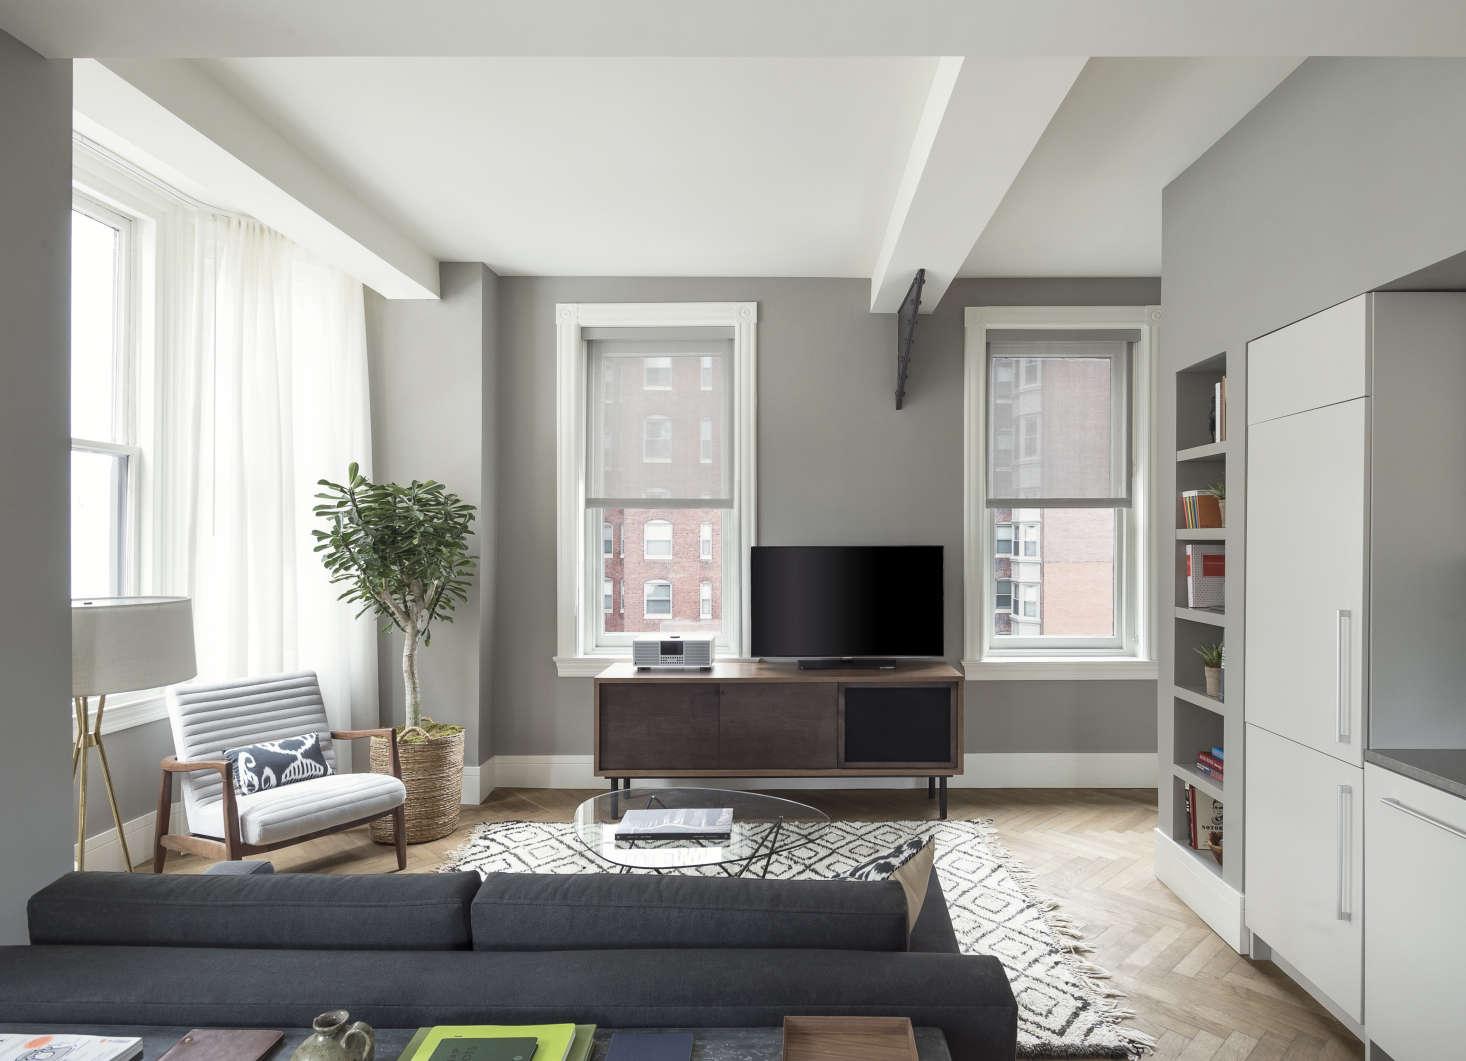 roost-living-room-remodelista-10